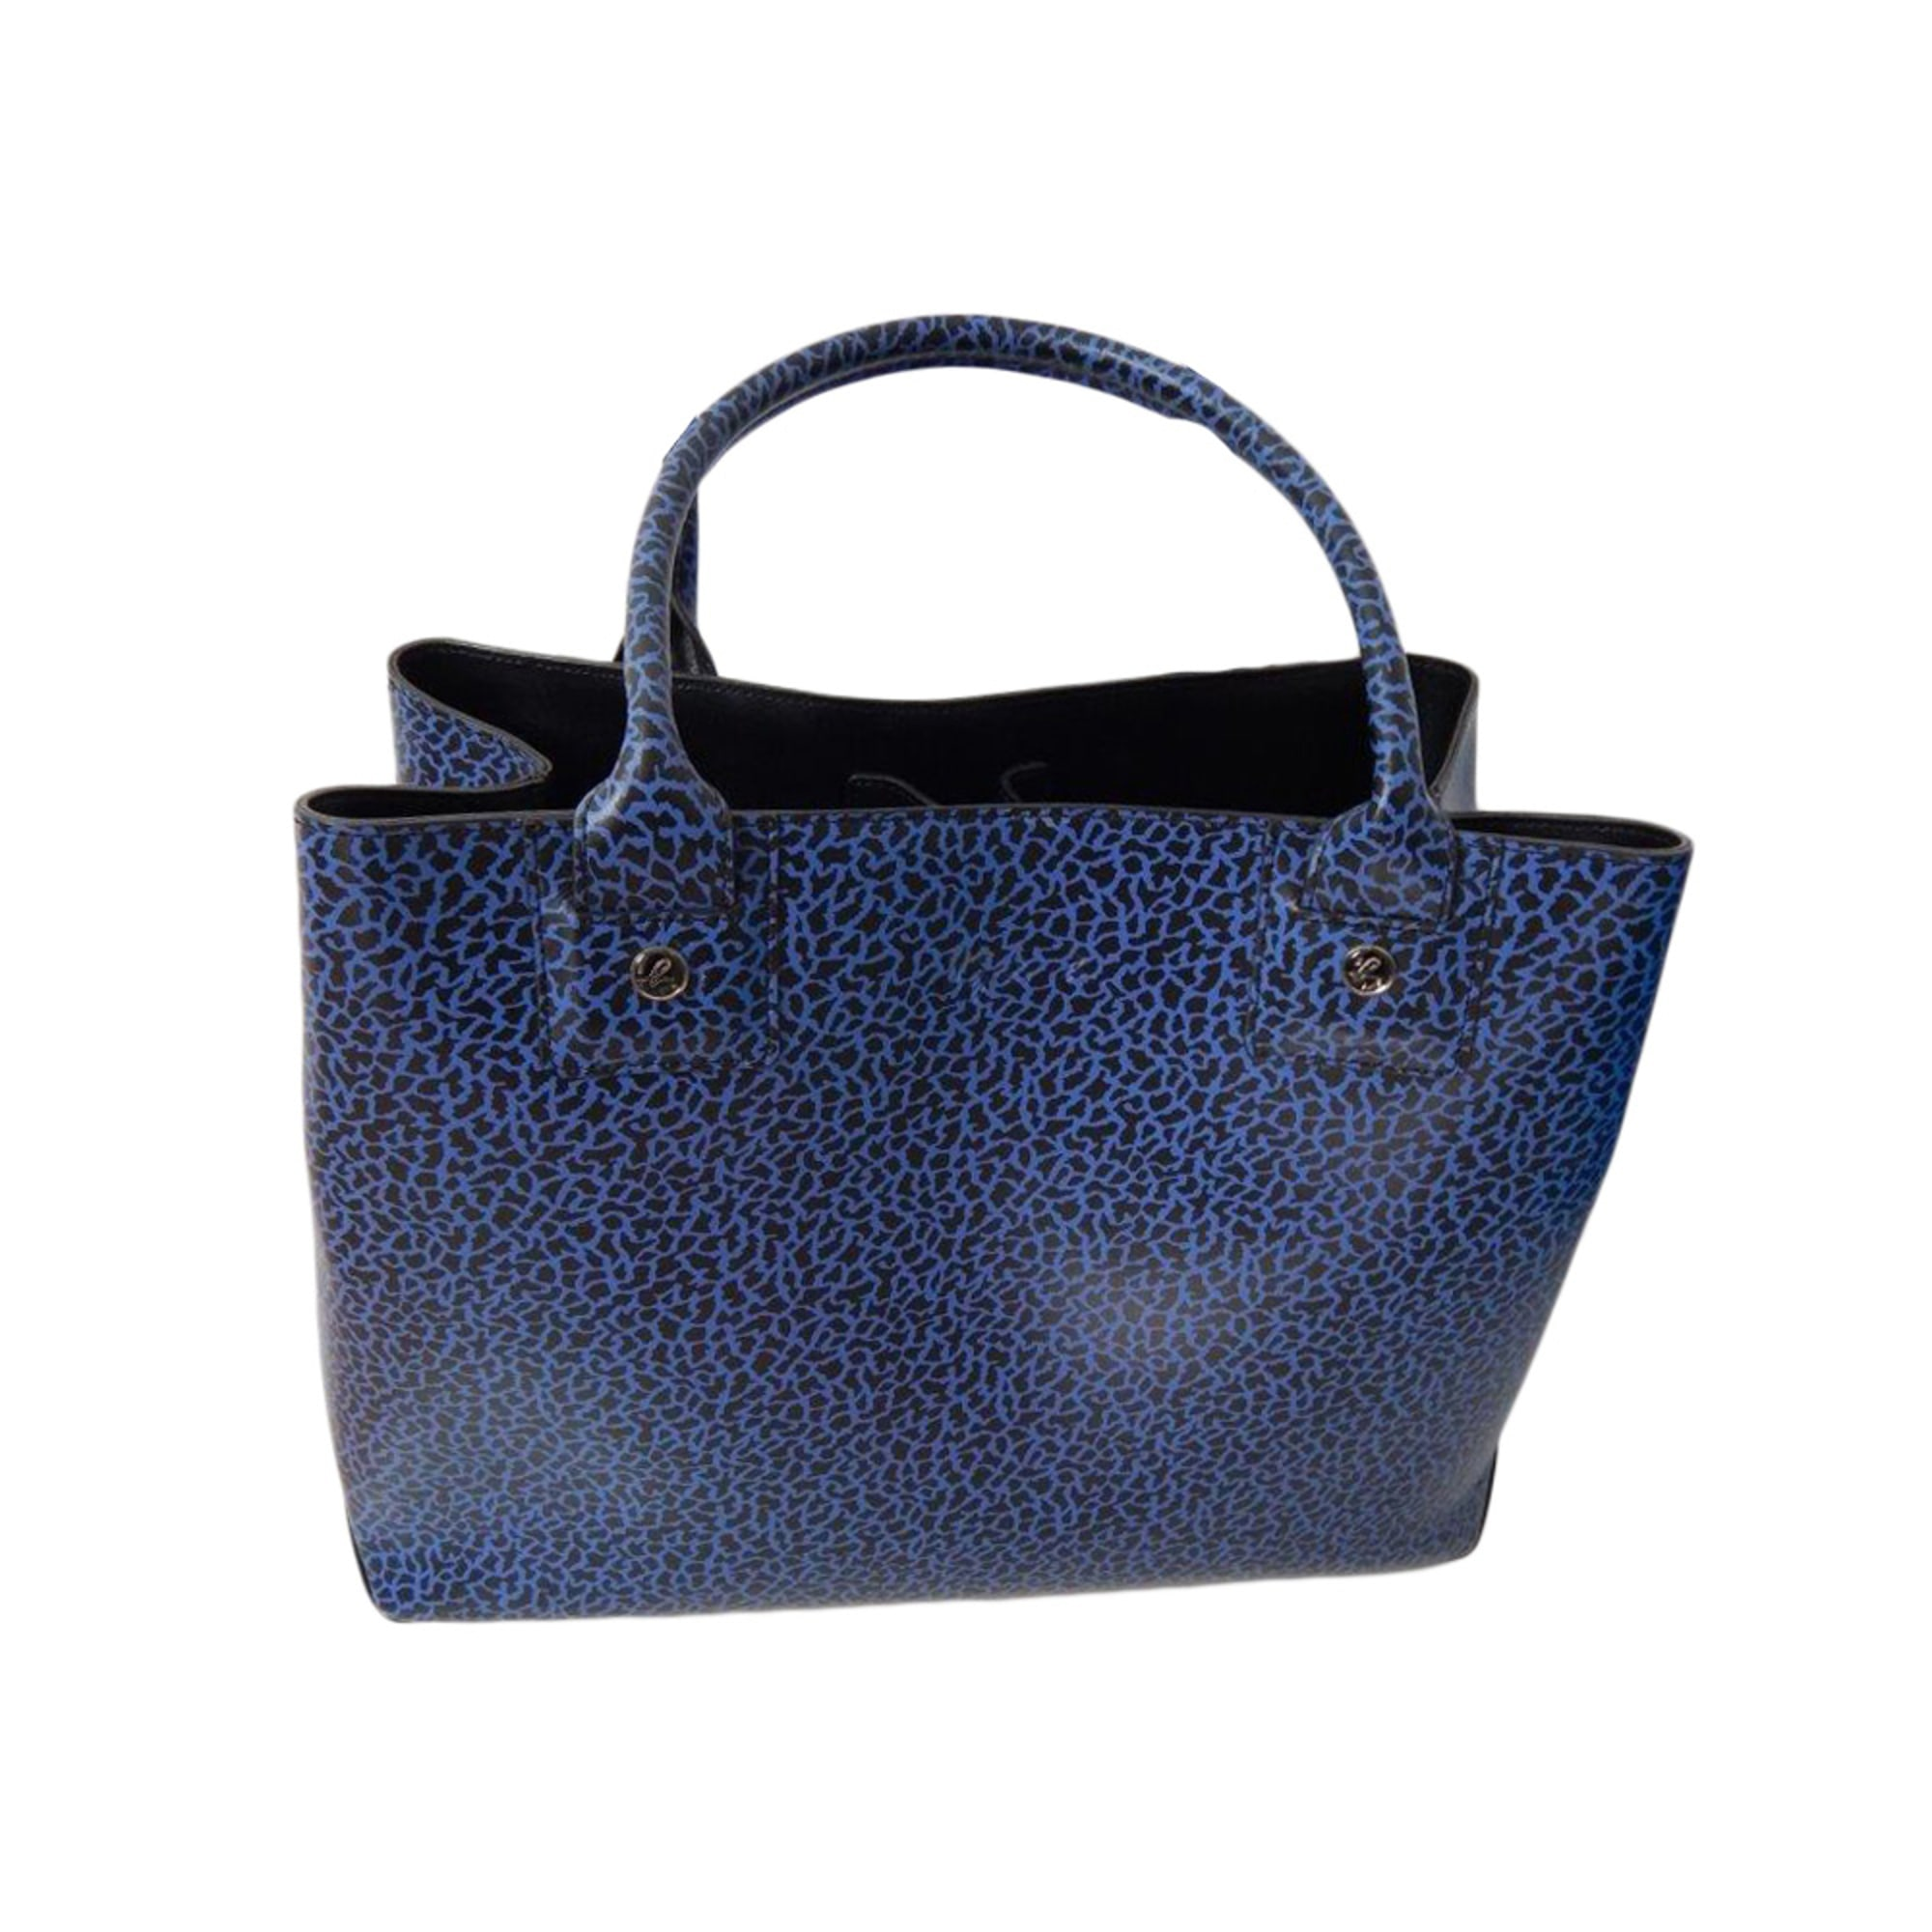 Sac en bandoulière en cuir AGNÈS B. Bleu, bleu marine, bleu turquoise